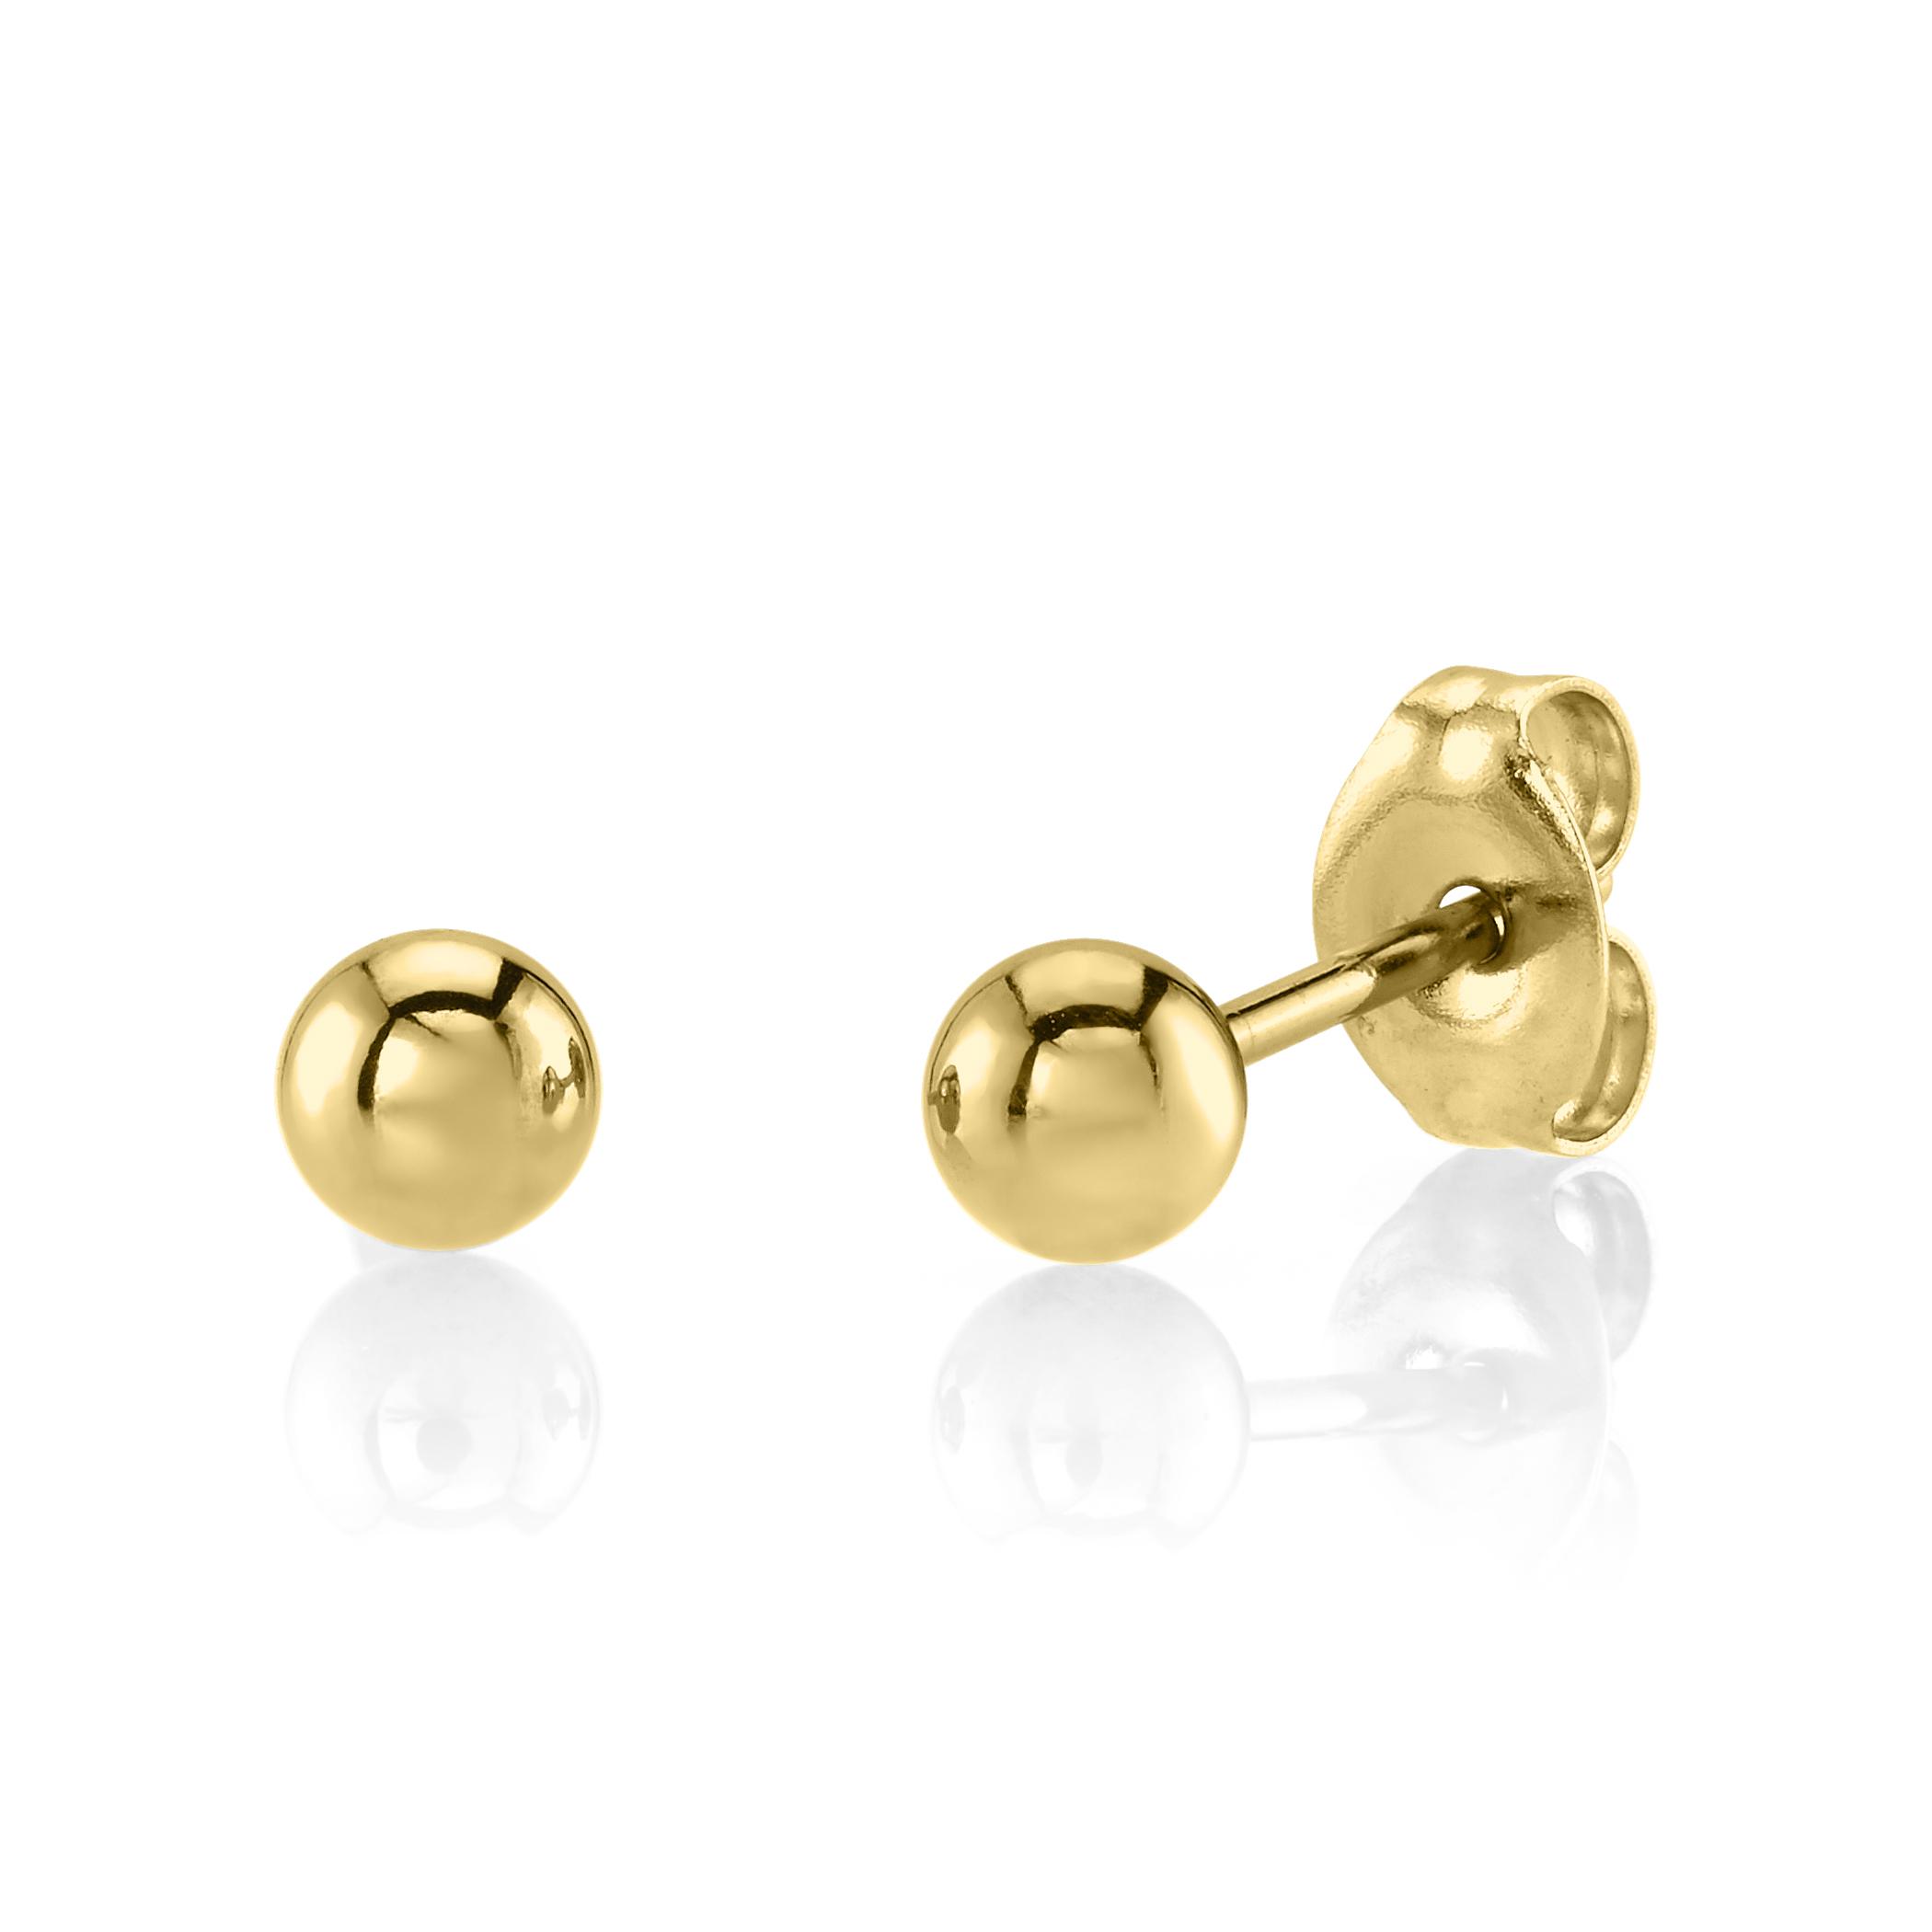 Gold Plated 3MM Gold Ball Ear Piercing Studs